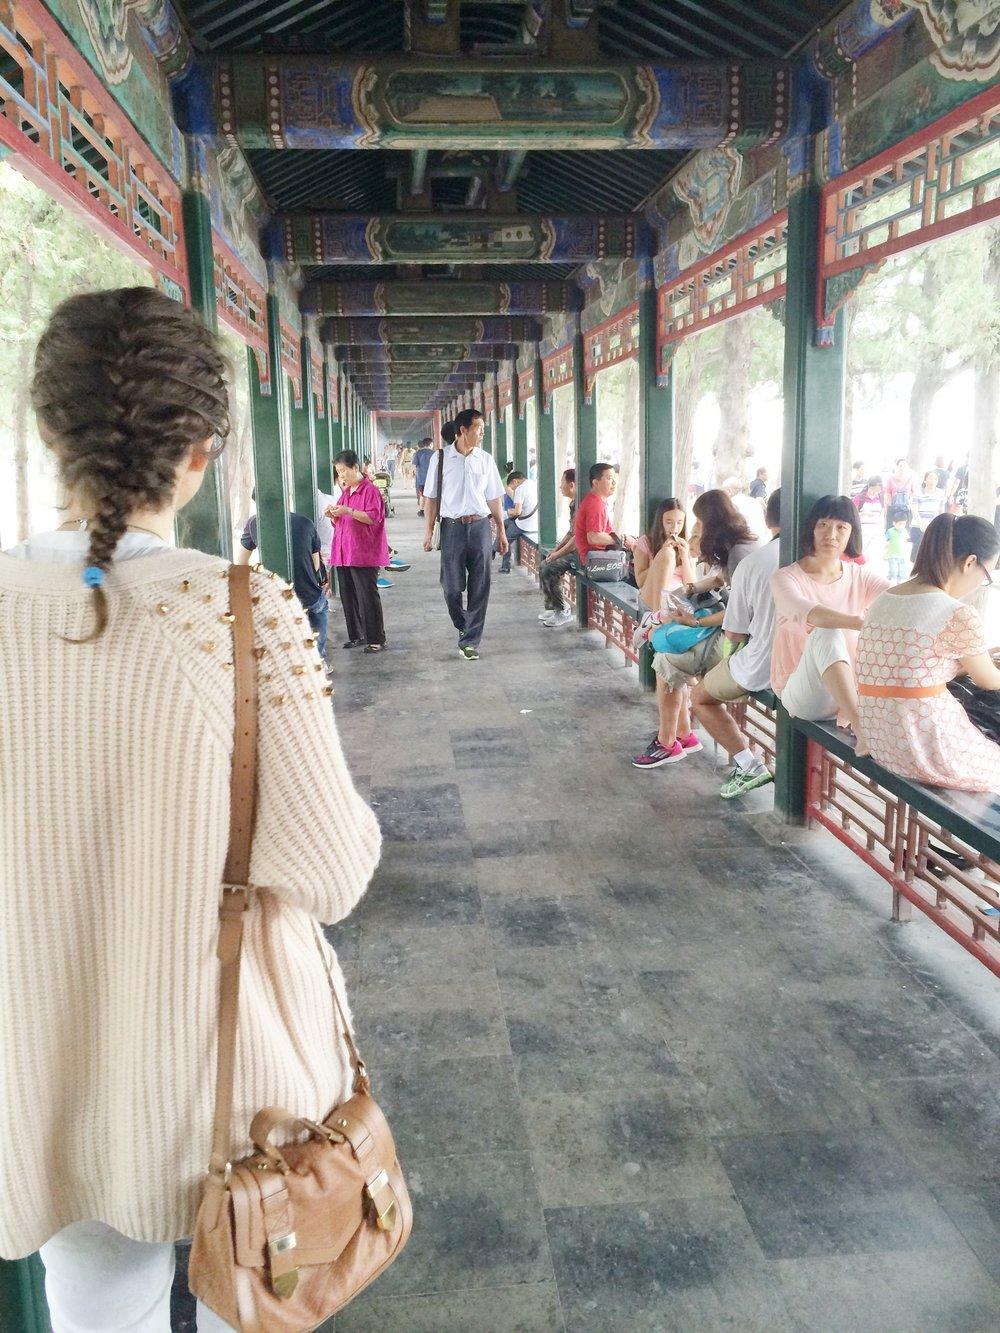 The Long Corridor - The Summer Palace Beijing